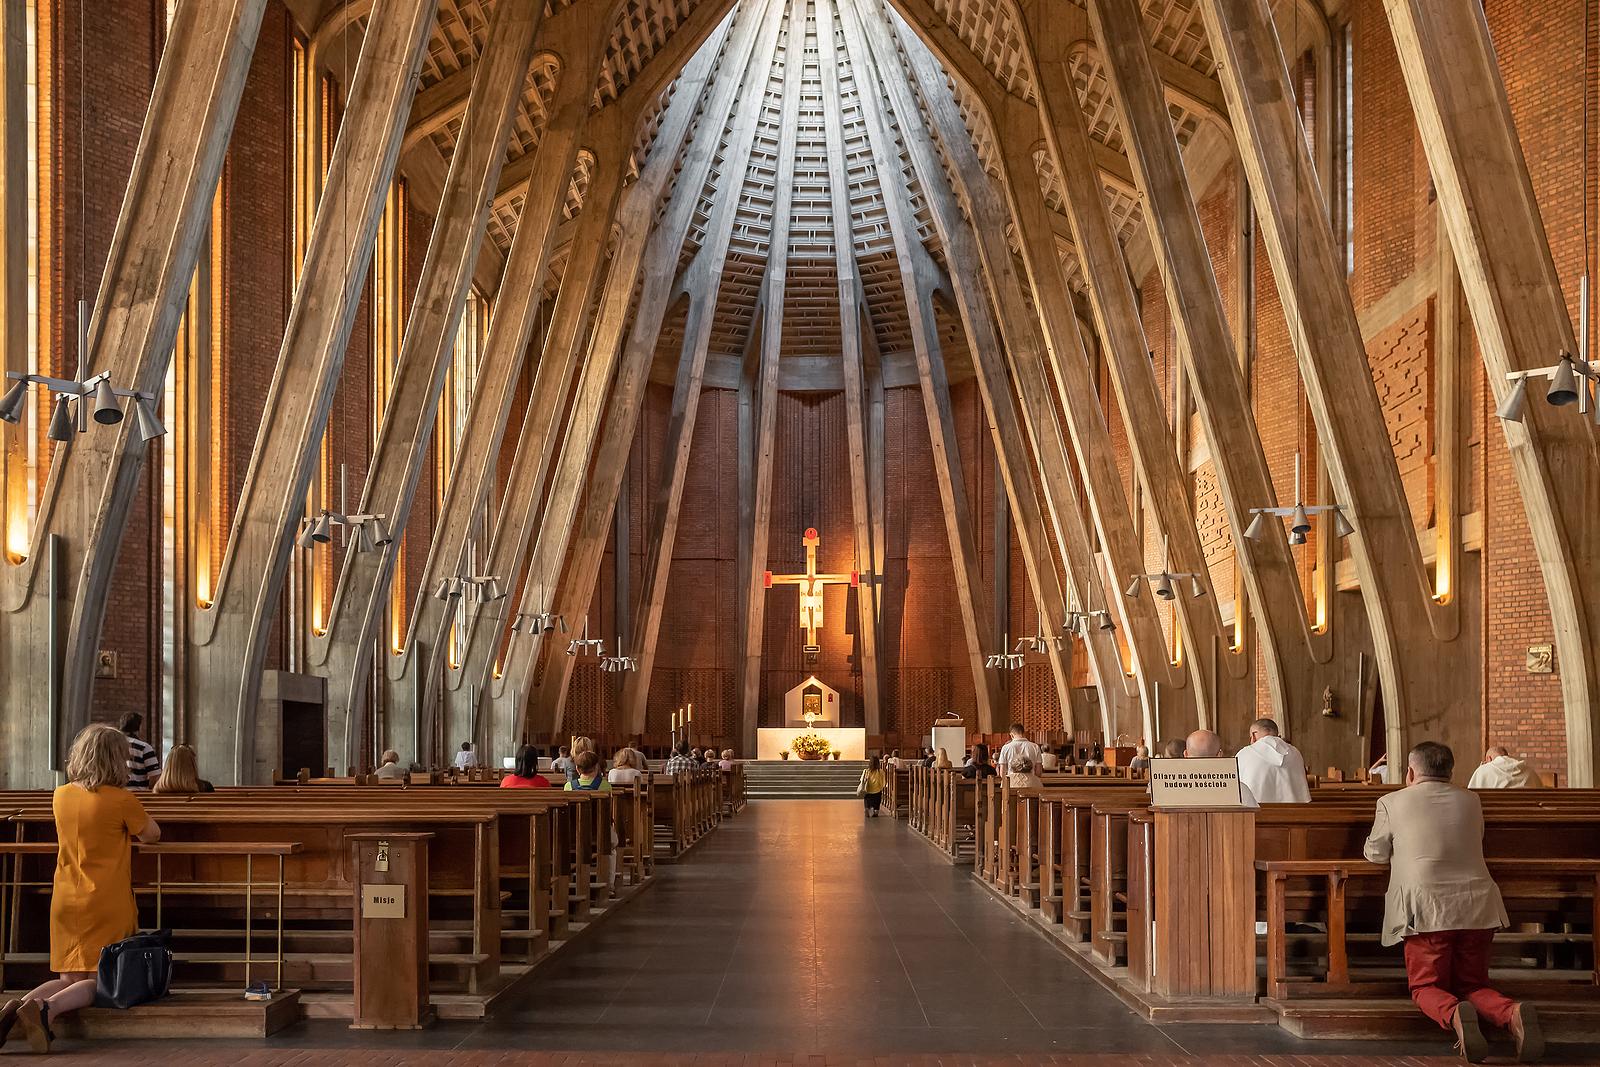 Poles pray inside a Warsaw church.